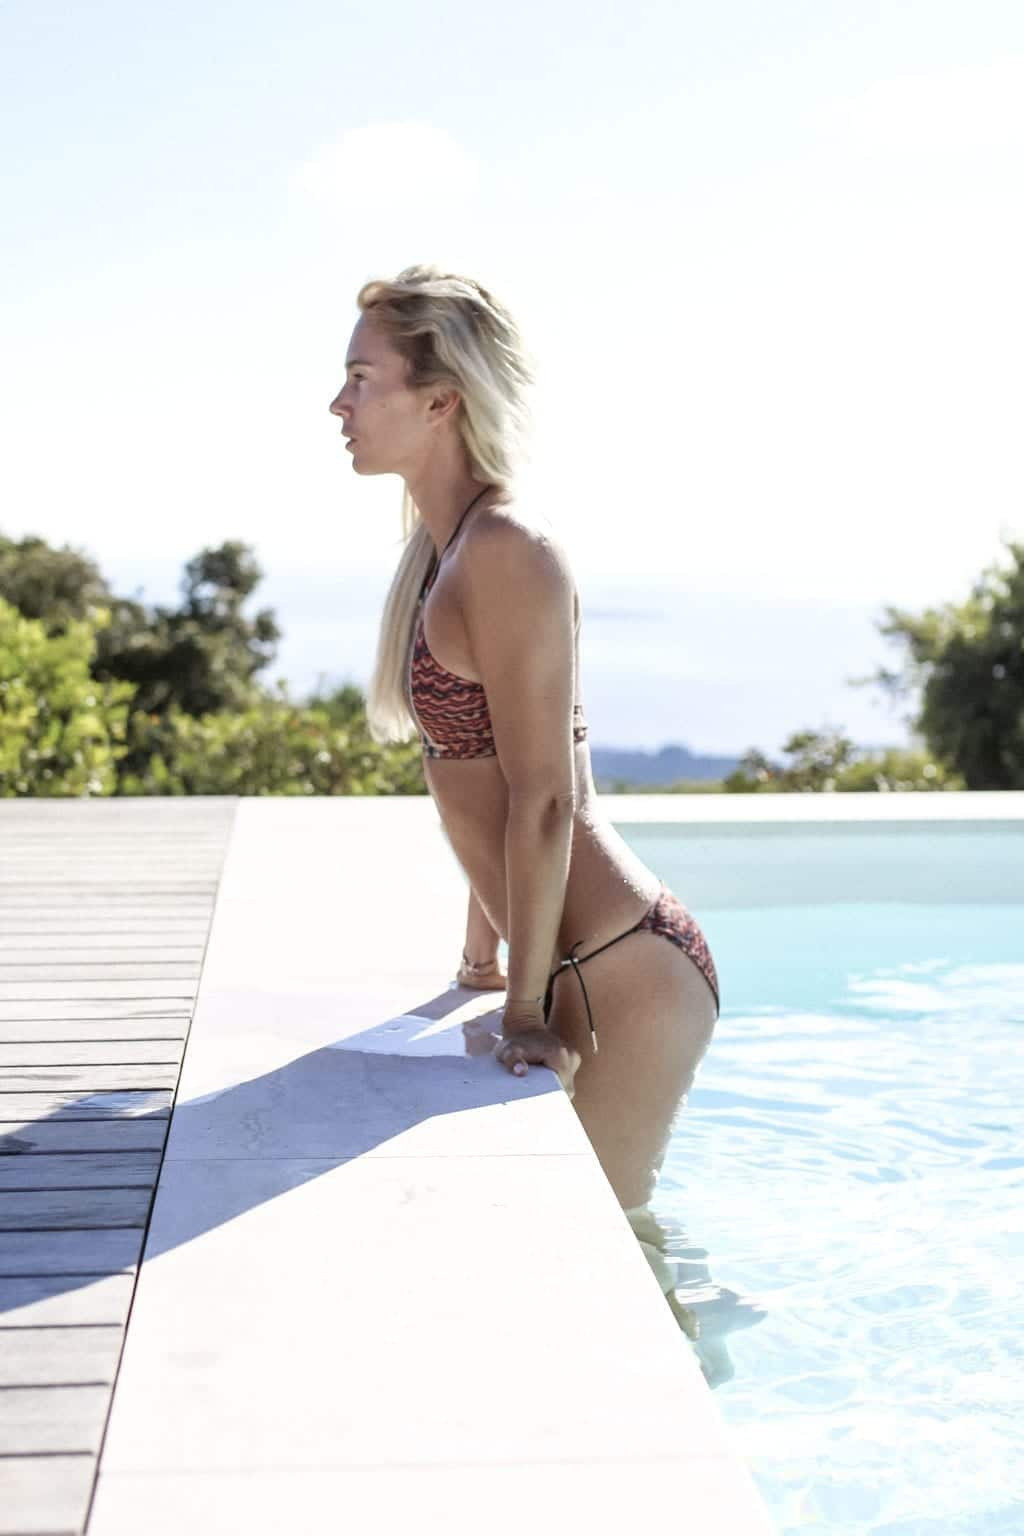 CK-1606_Sardinien-Sardegna-Sardinia-Italy-Italia-Fashion-Blog-Beach-Caribbean-Dress-Blonde-Karin-Kaswurm-Bikini-Kiini-2